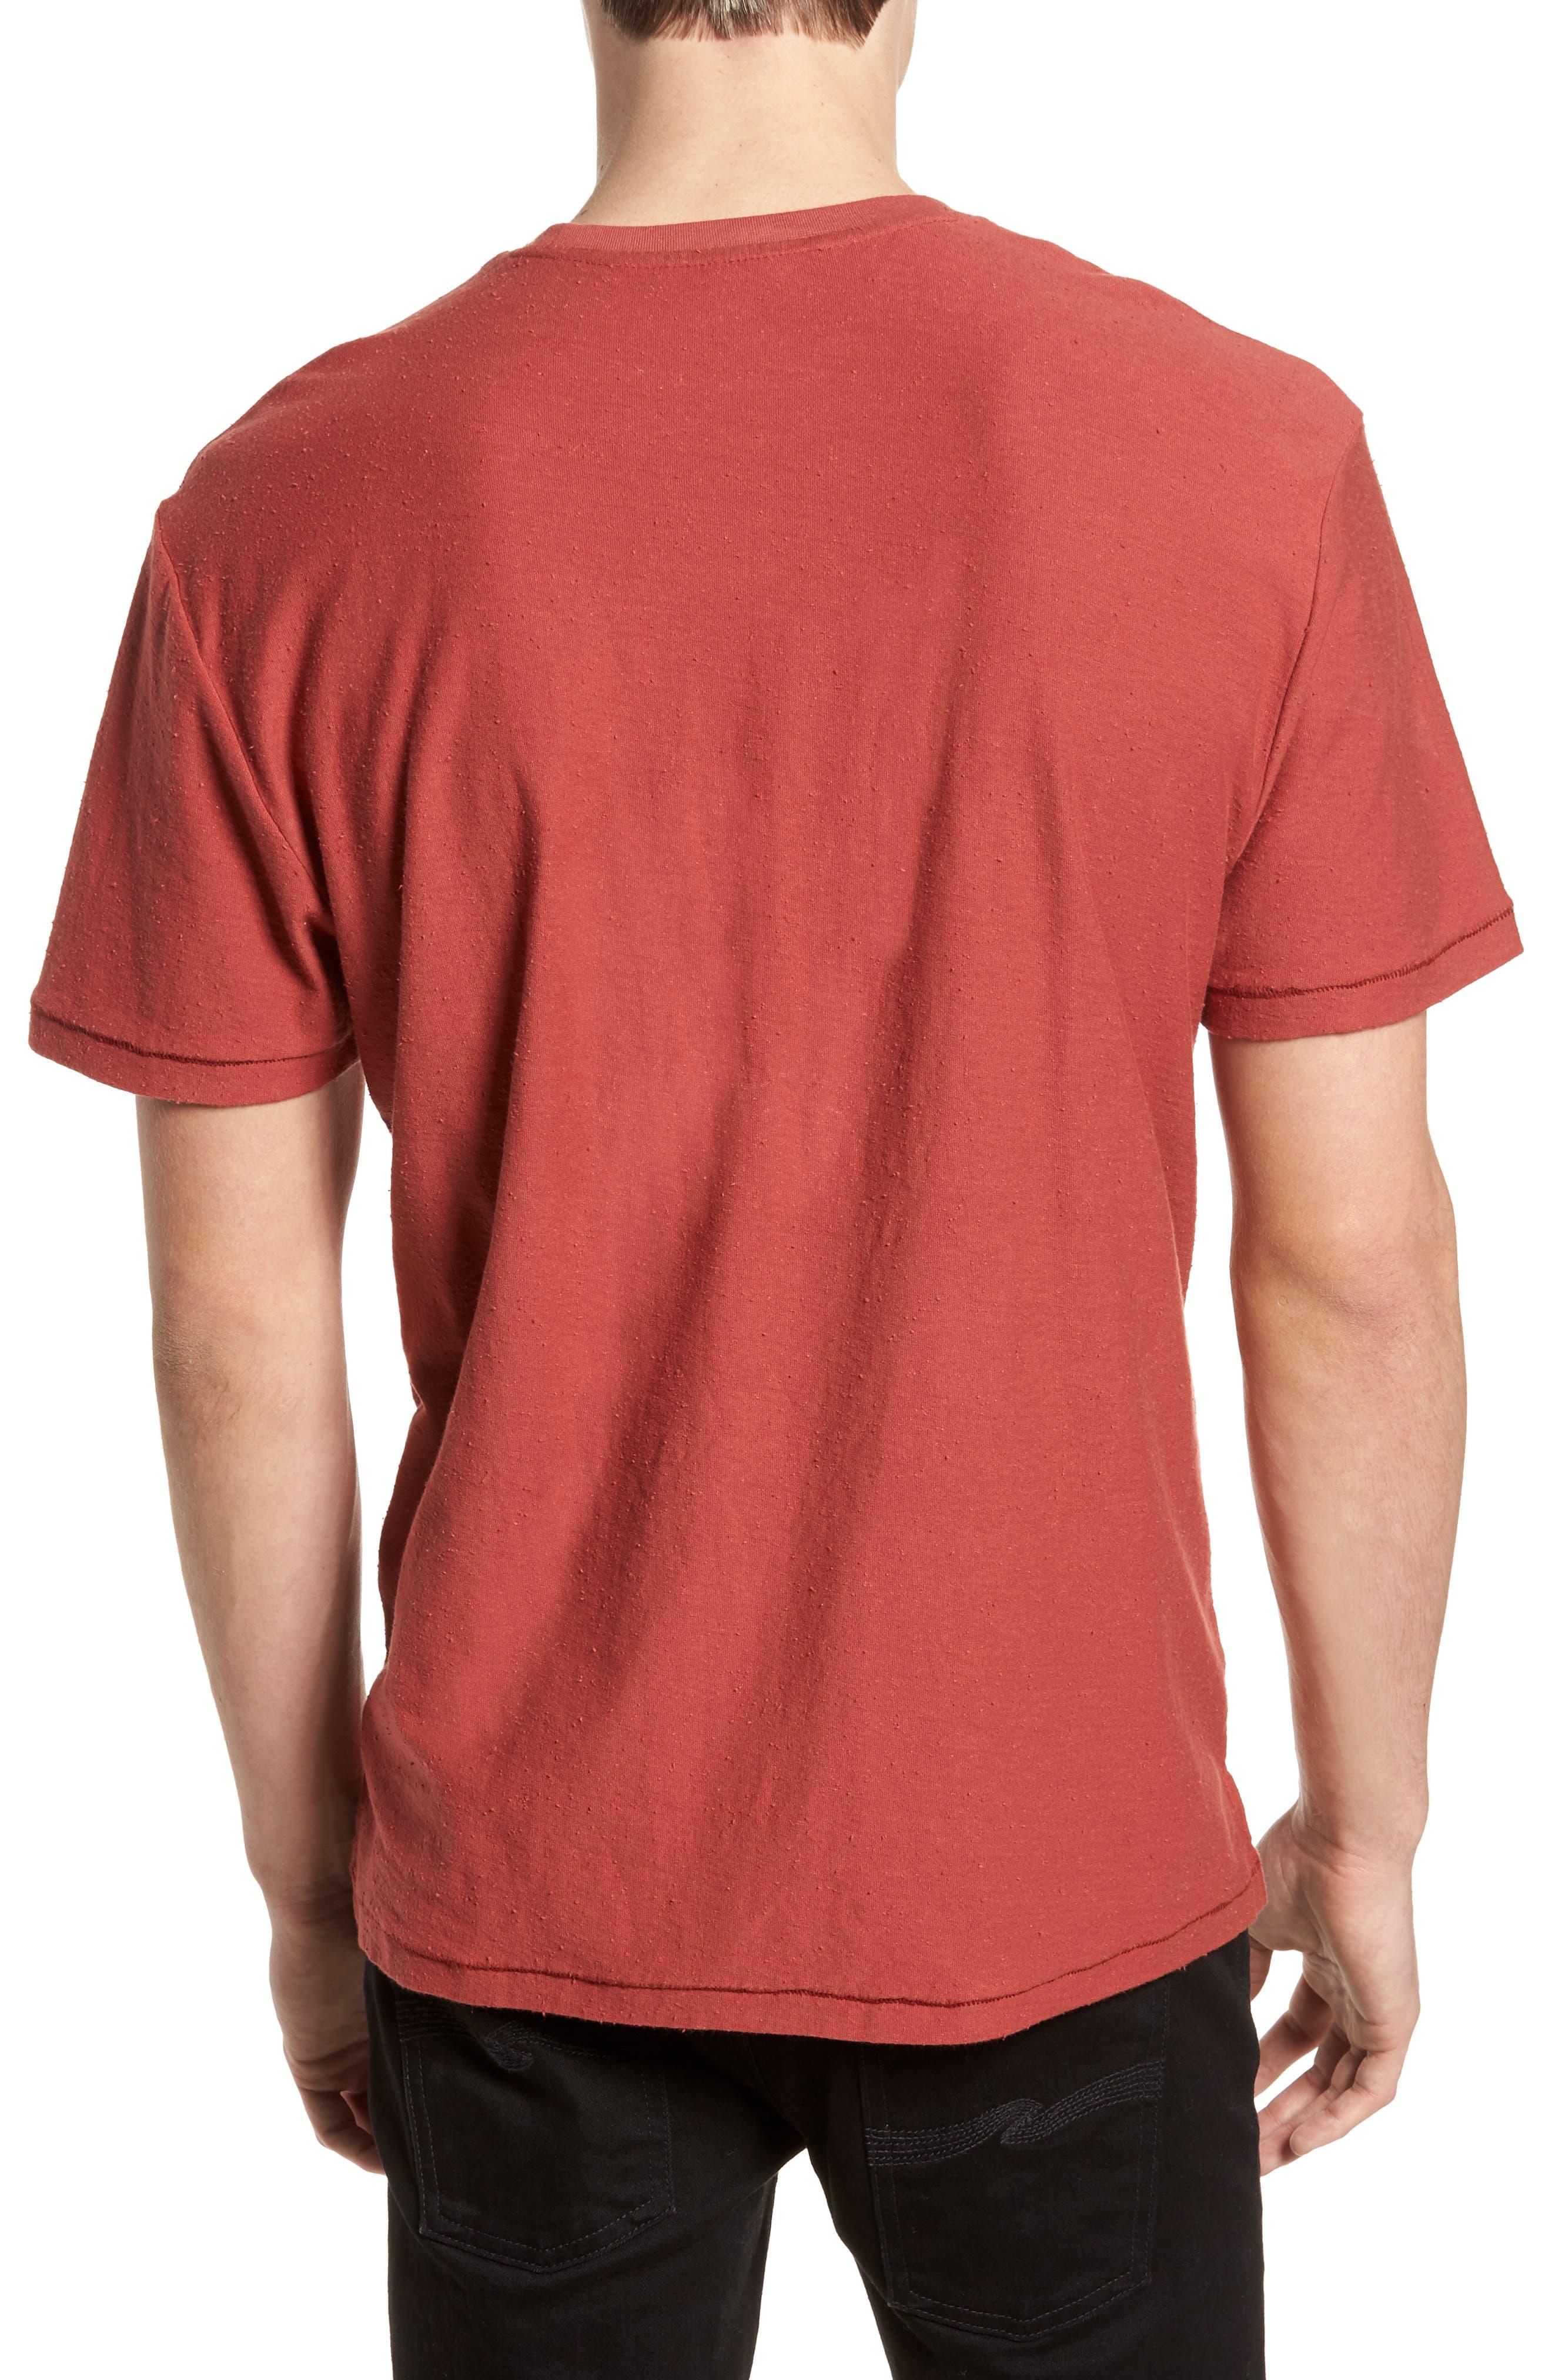 Nep Cotton Pocket T-Shirt,                             Alternate thumbnail 2, color,                             221